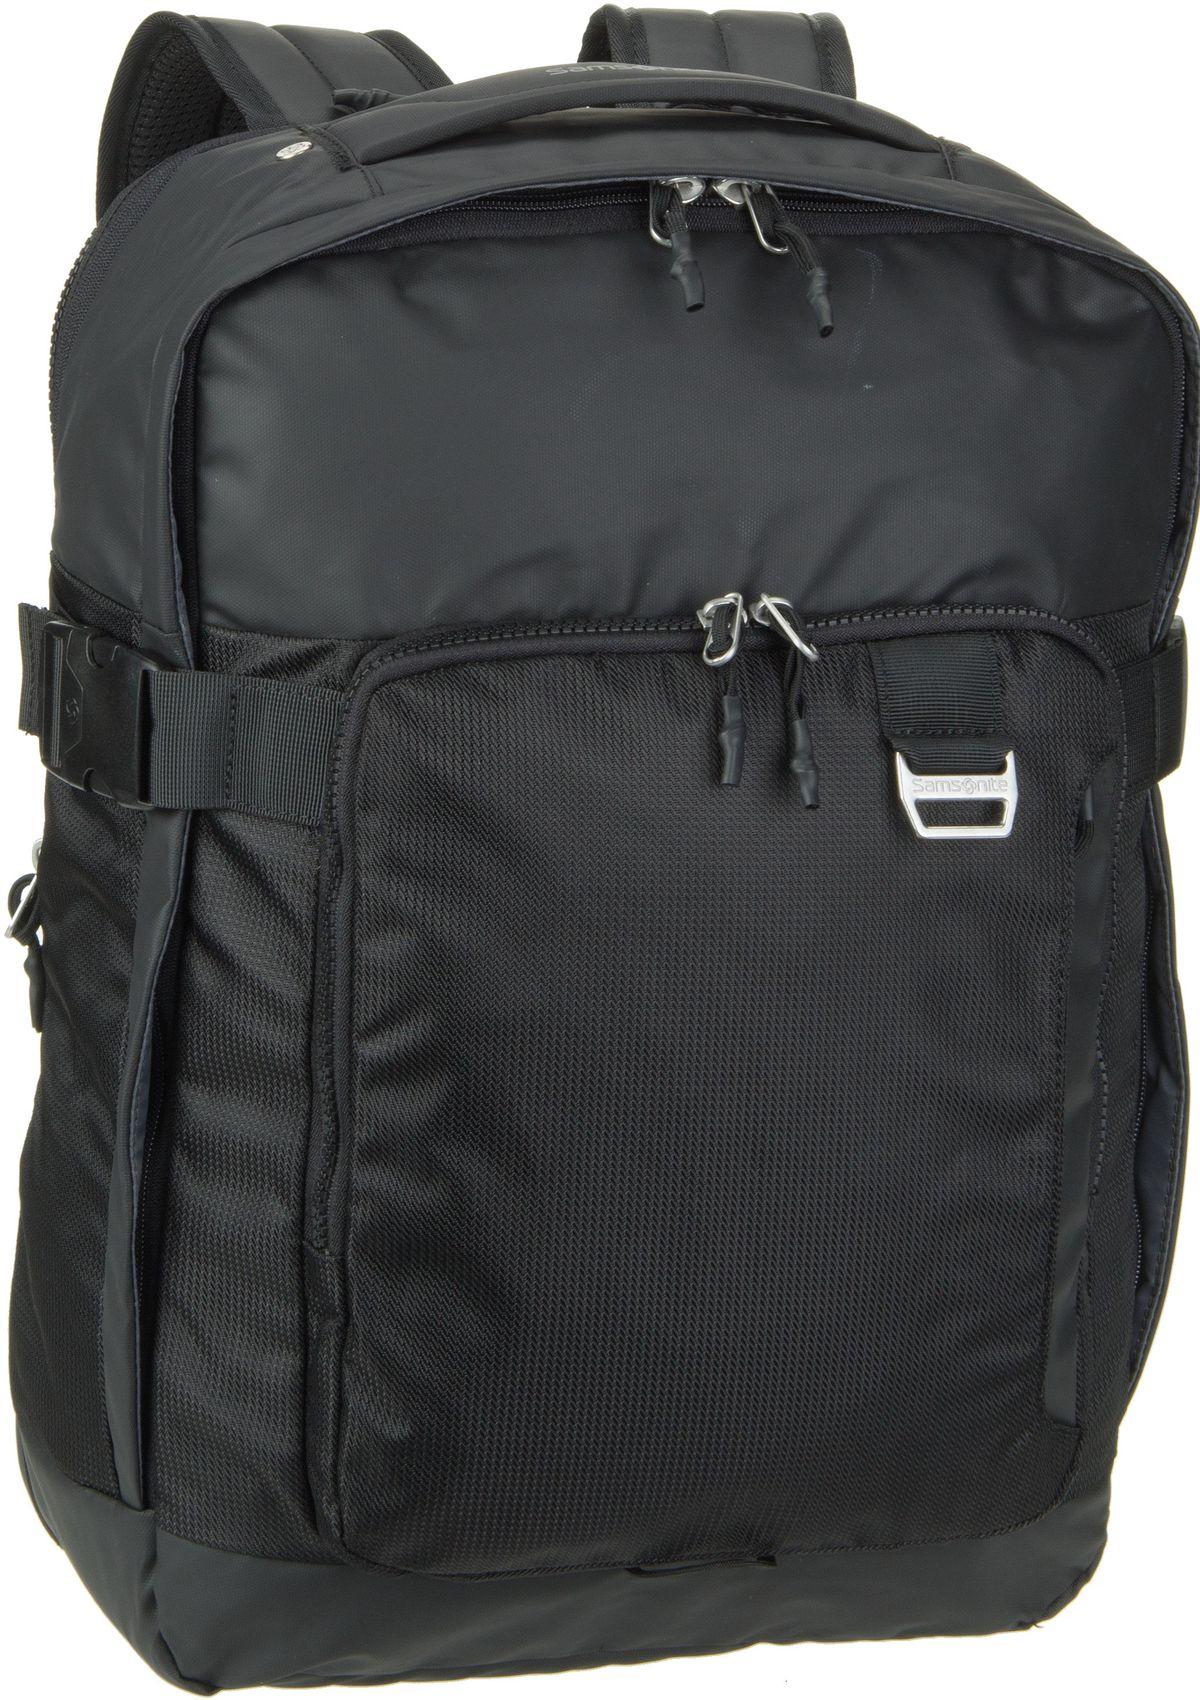 Laptoprucksack Midtown Laptop Backpack L exp Black (29 Liter)